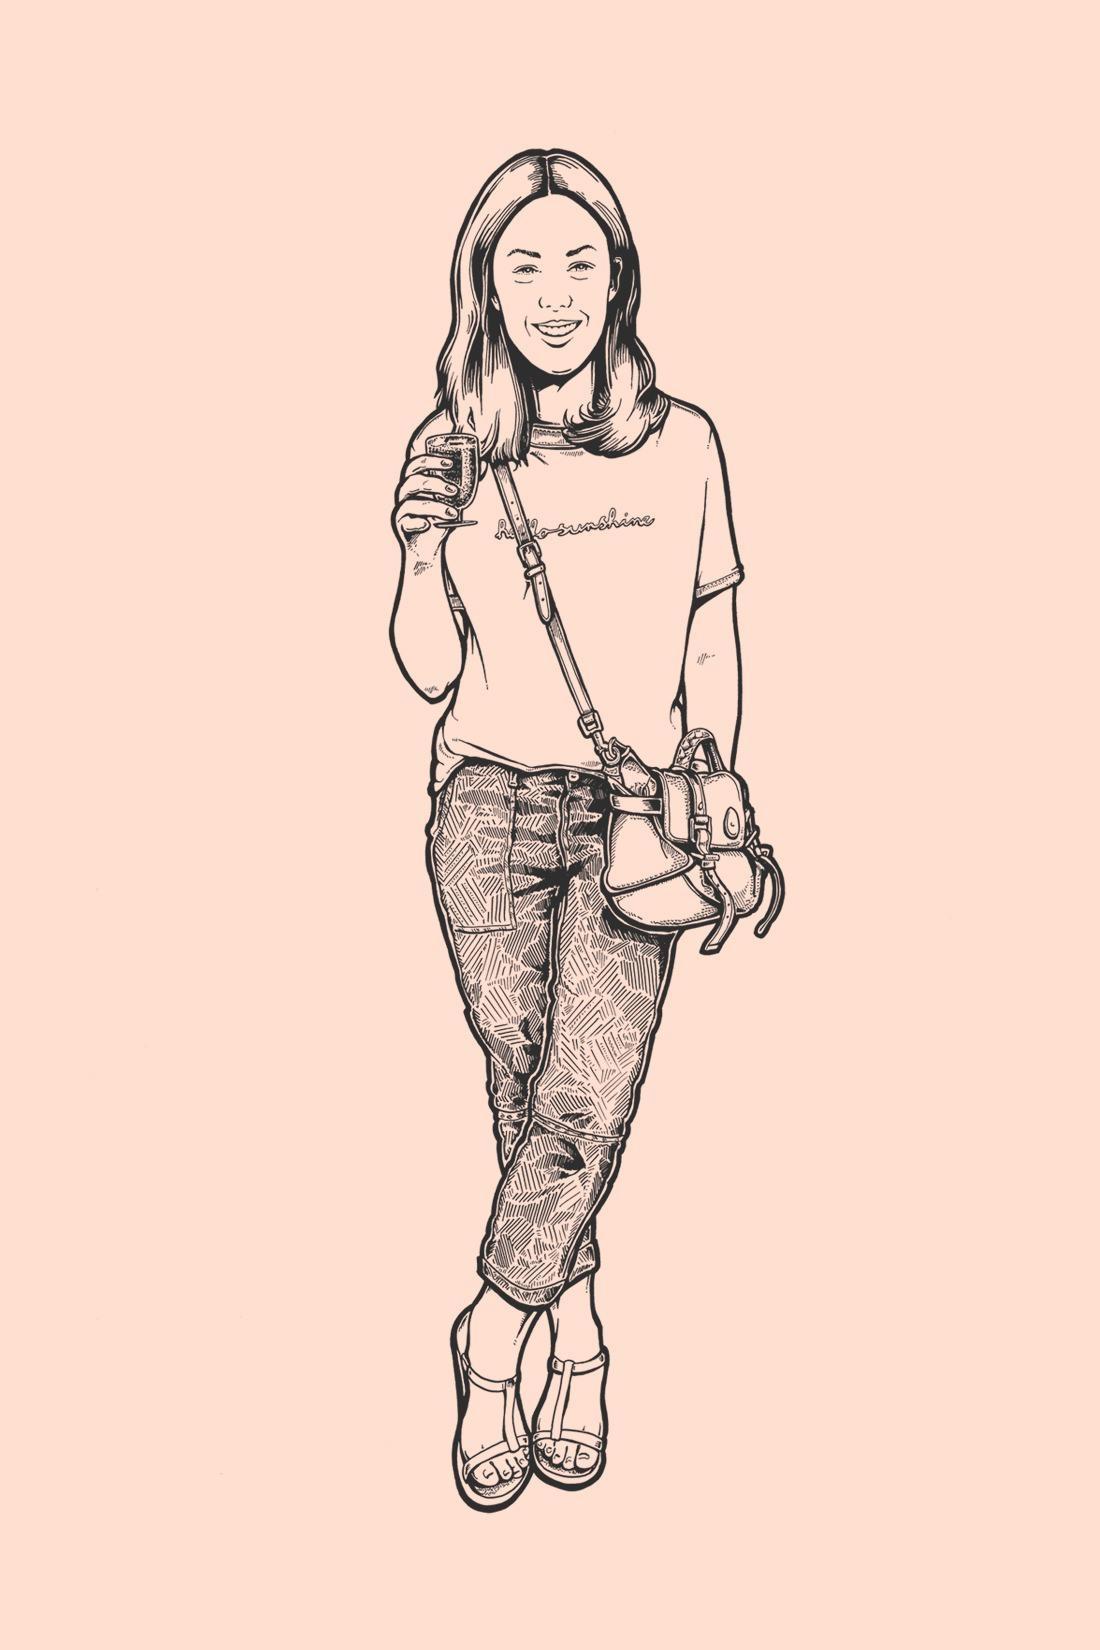 Me! Katy Cowan of [Creative Boom](http://www.creativeboom.com)